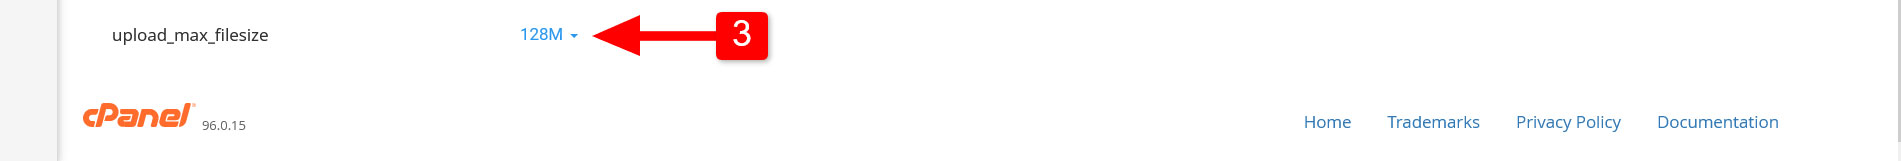 upload-max-filesize en cPanel-2